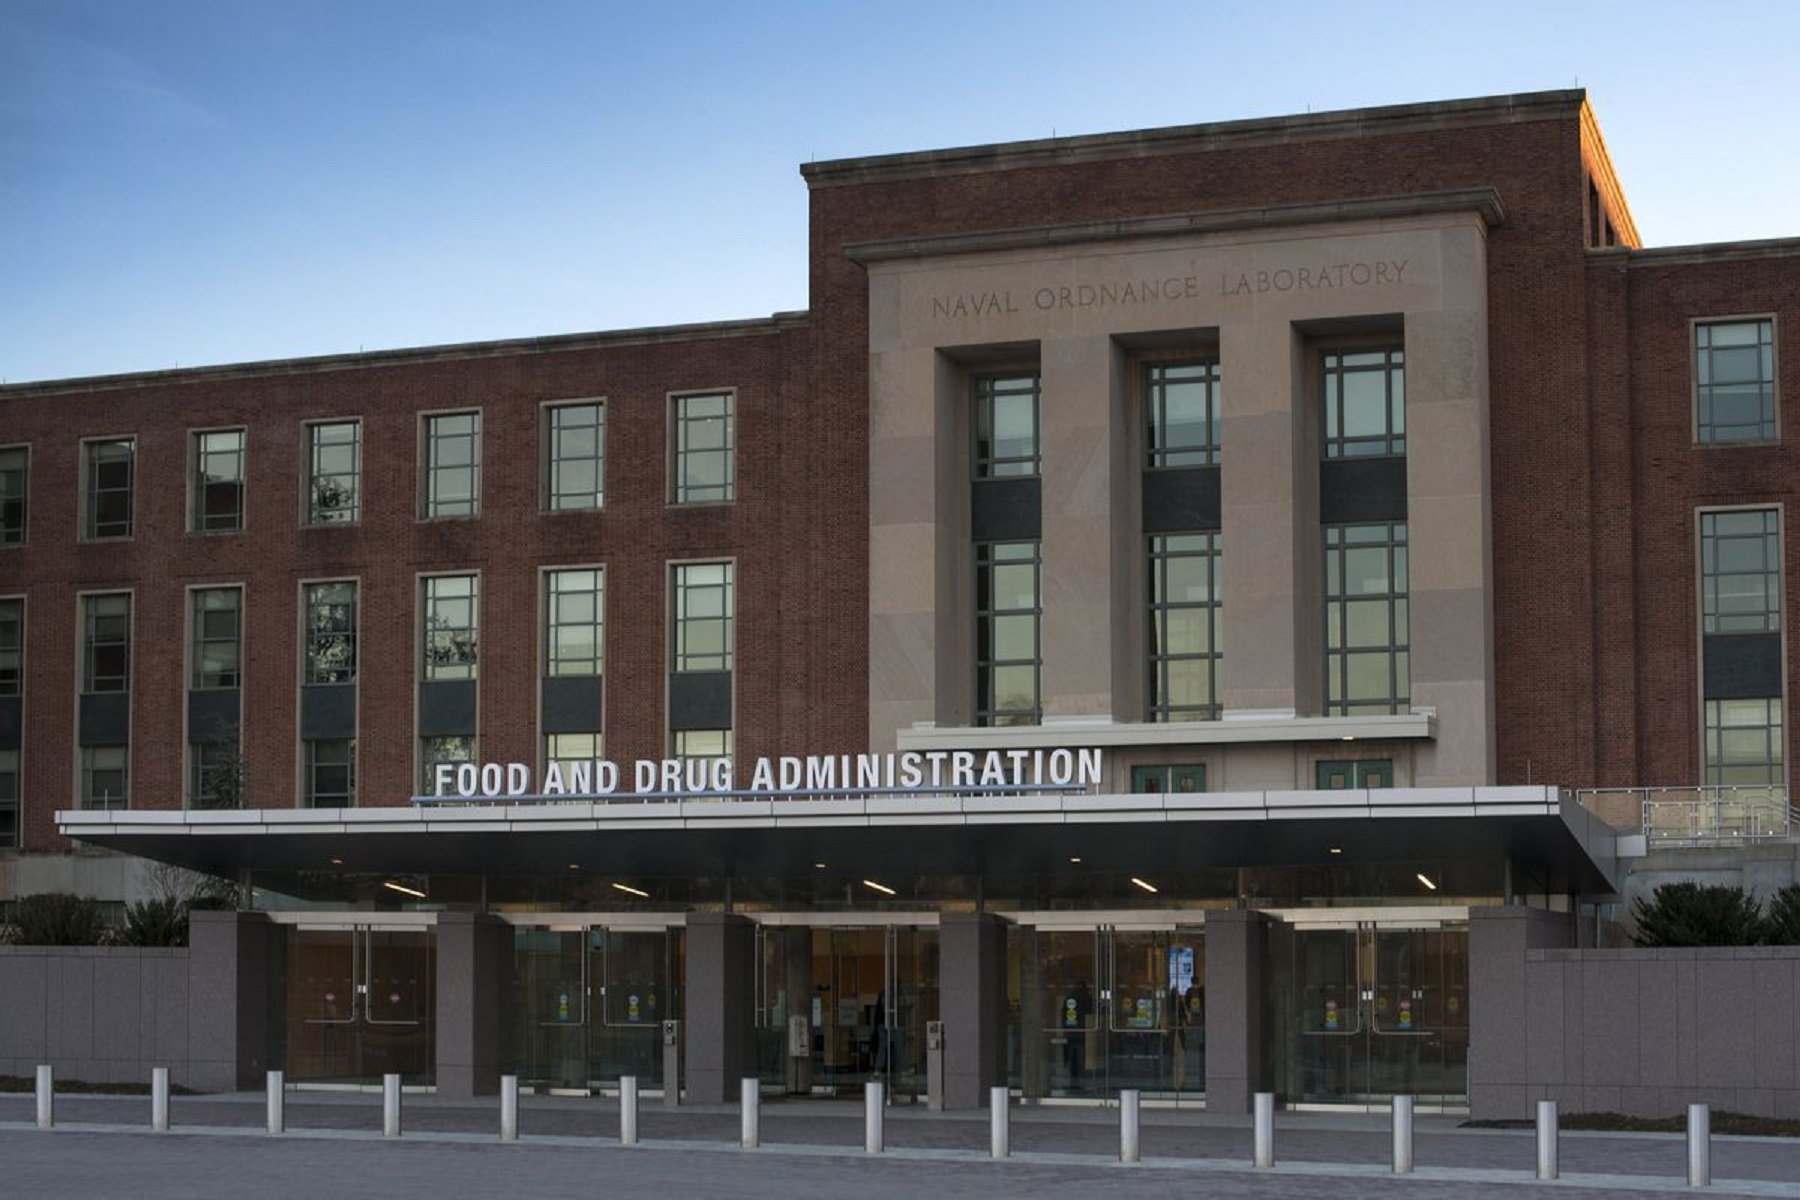 FDA ΗΠΑ: Προειδοποιεί τους γιατρούς να σταματήσουν να εμφυτεύουν αντλία καρδιάς που συνδέεται με θανάτους